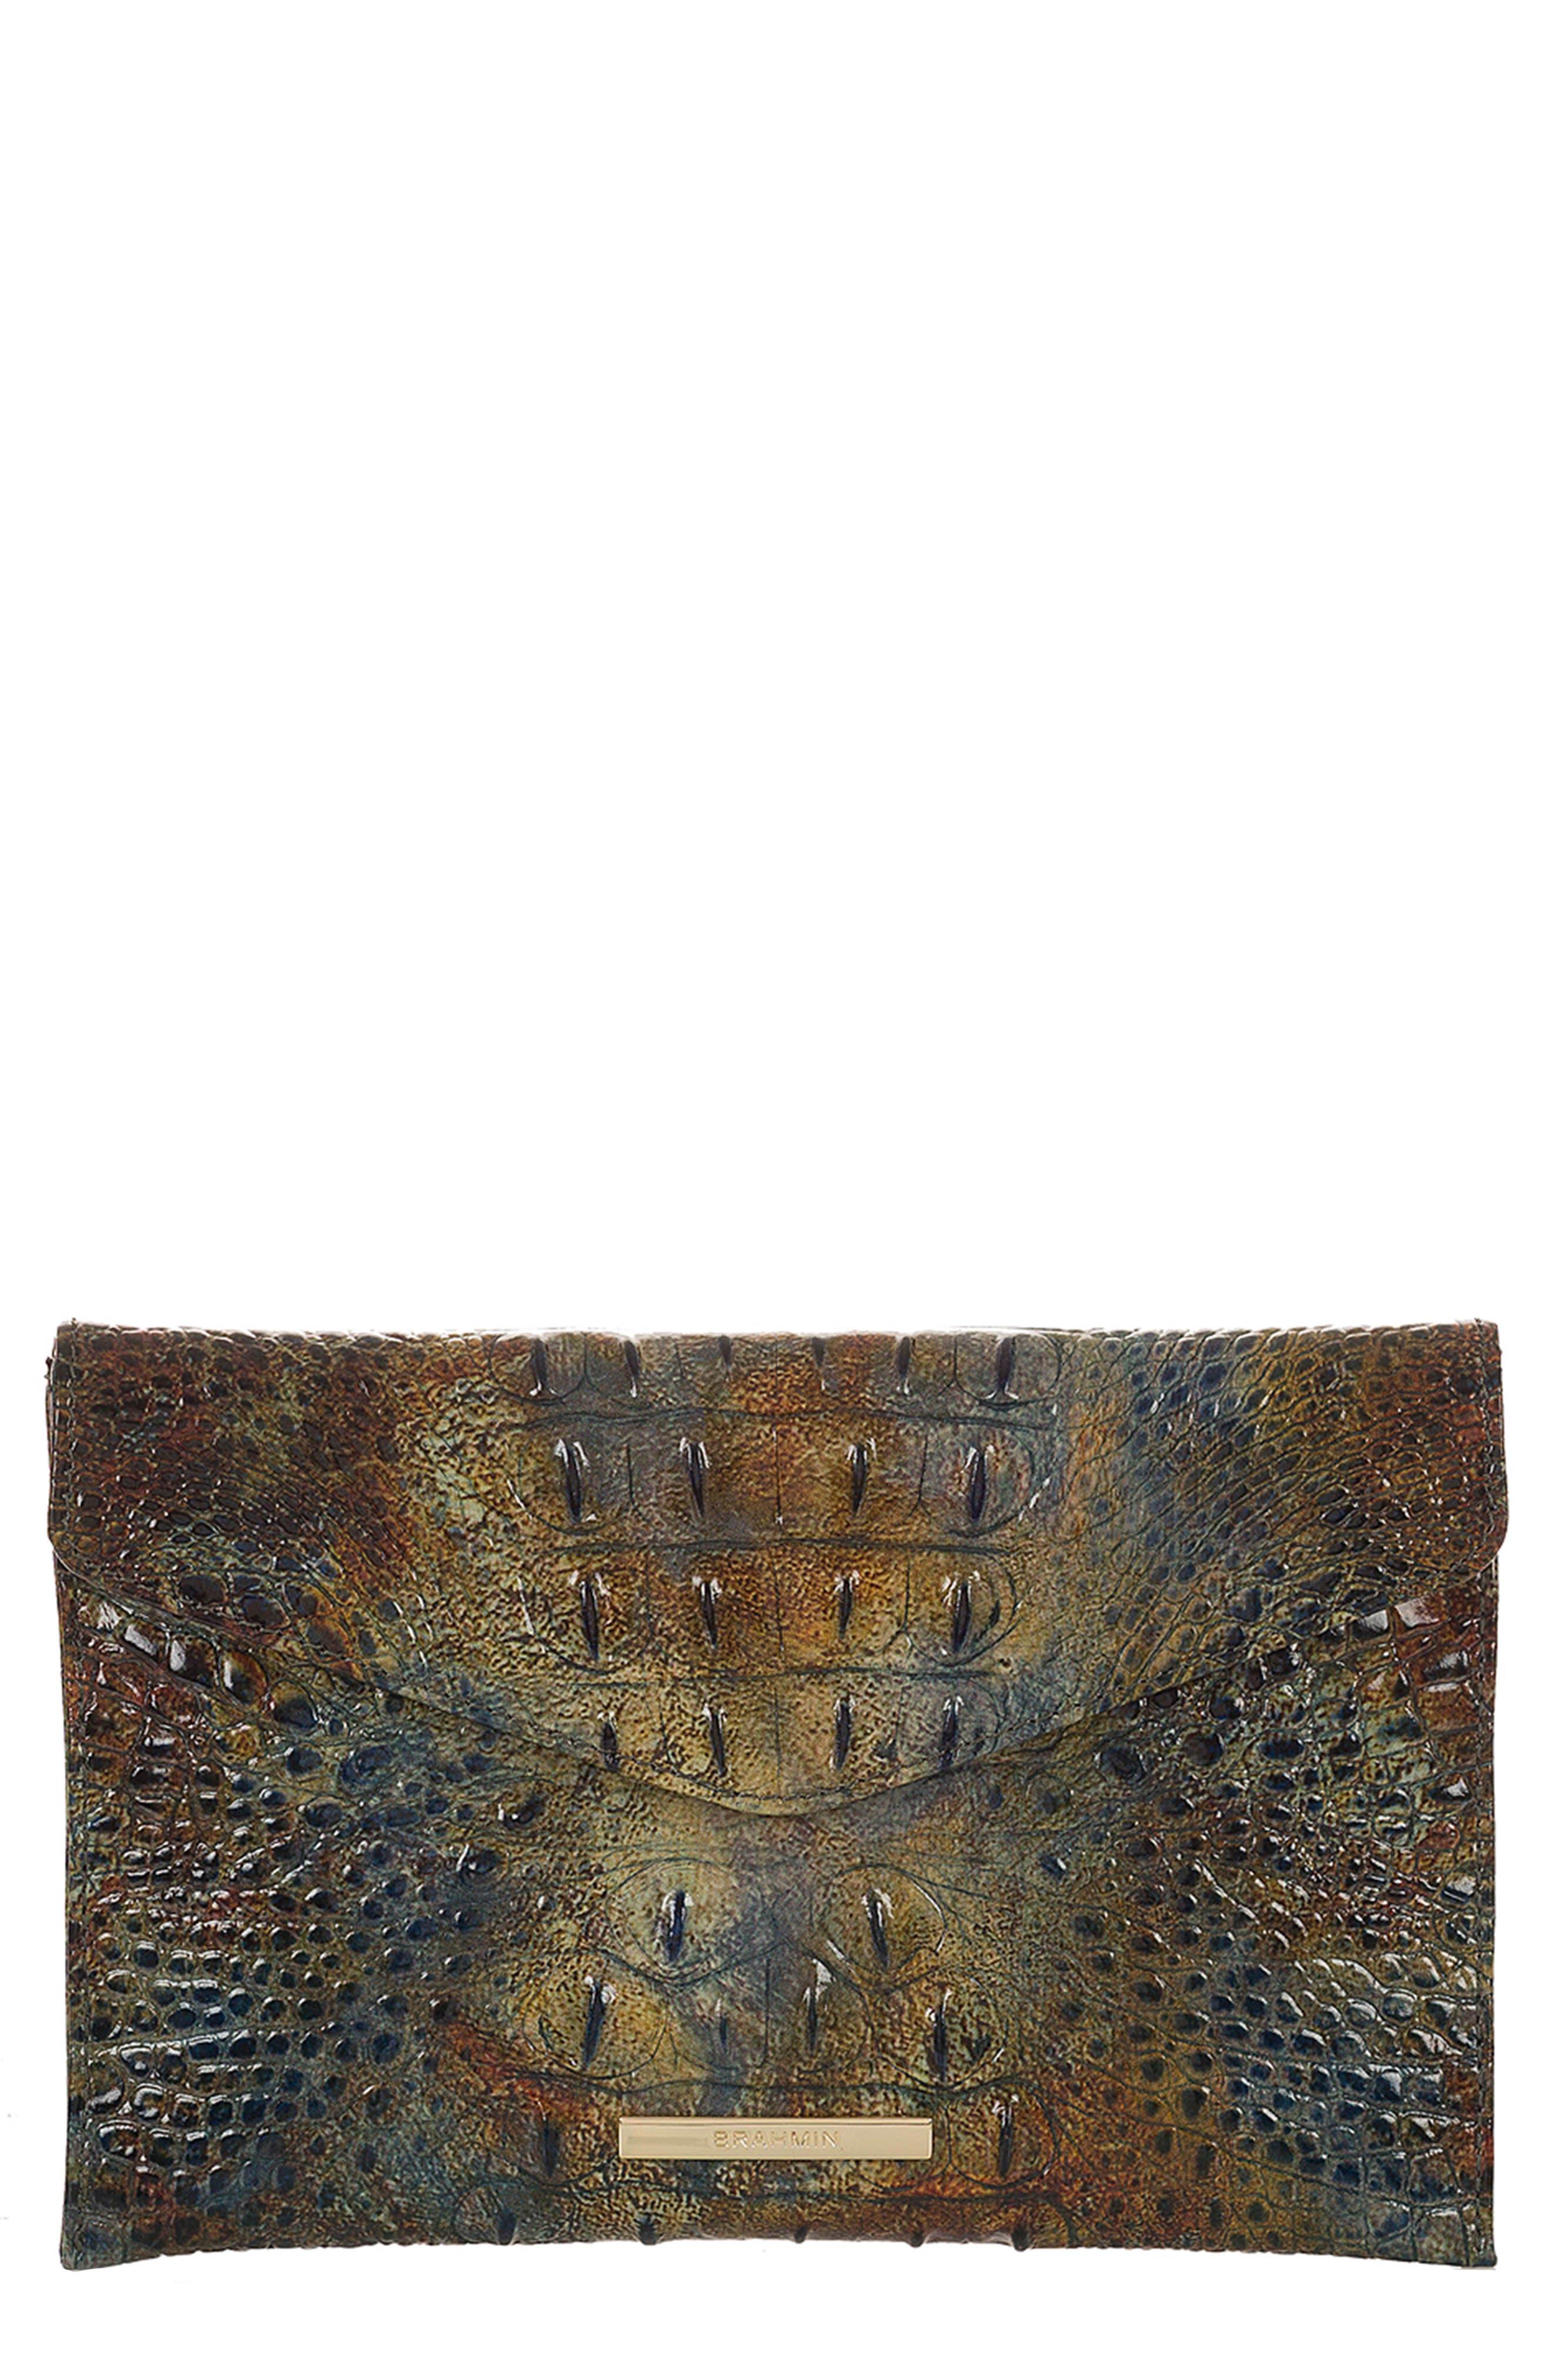 BRAHMIN Melbourne Croc Embossed Leather Envelope Clutch, Main, color, 204